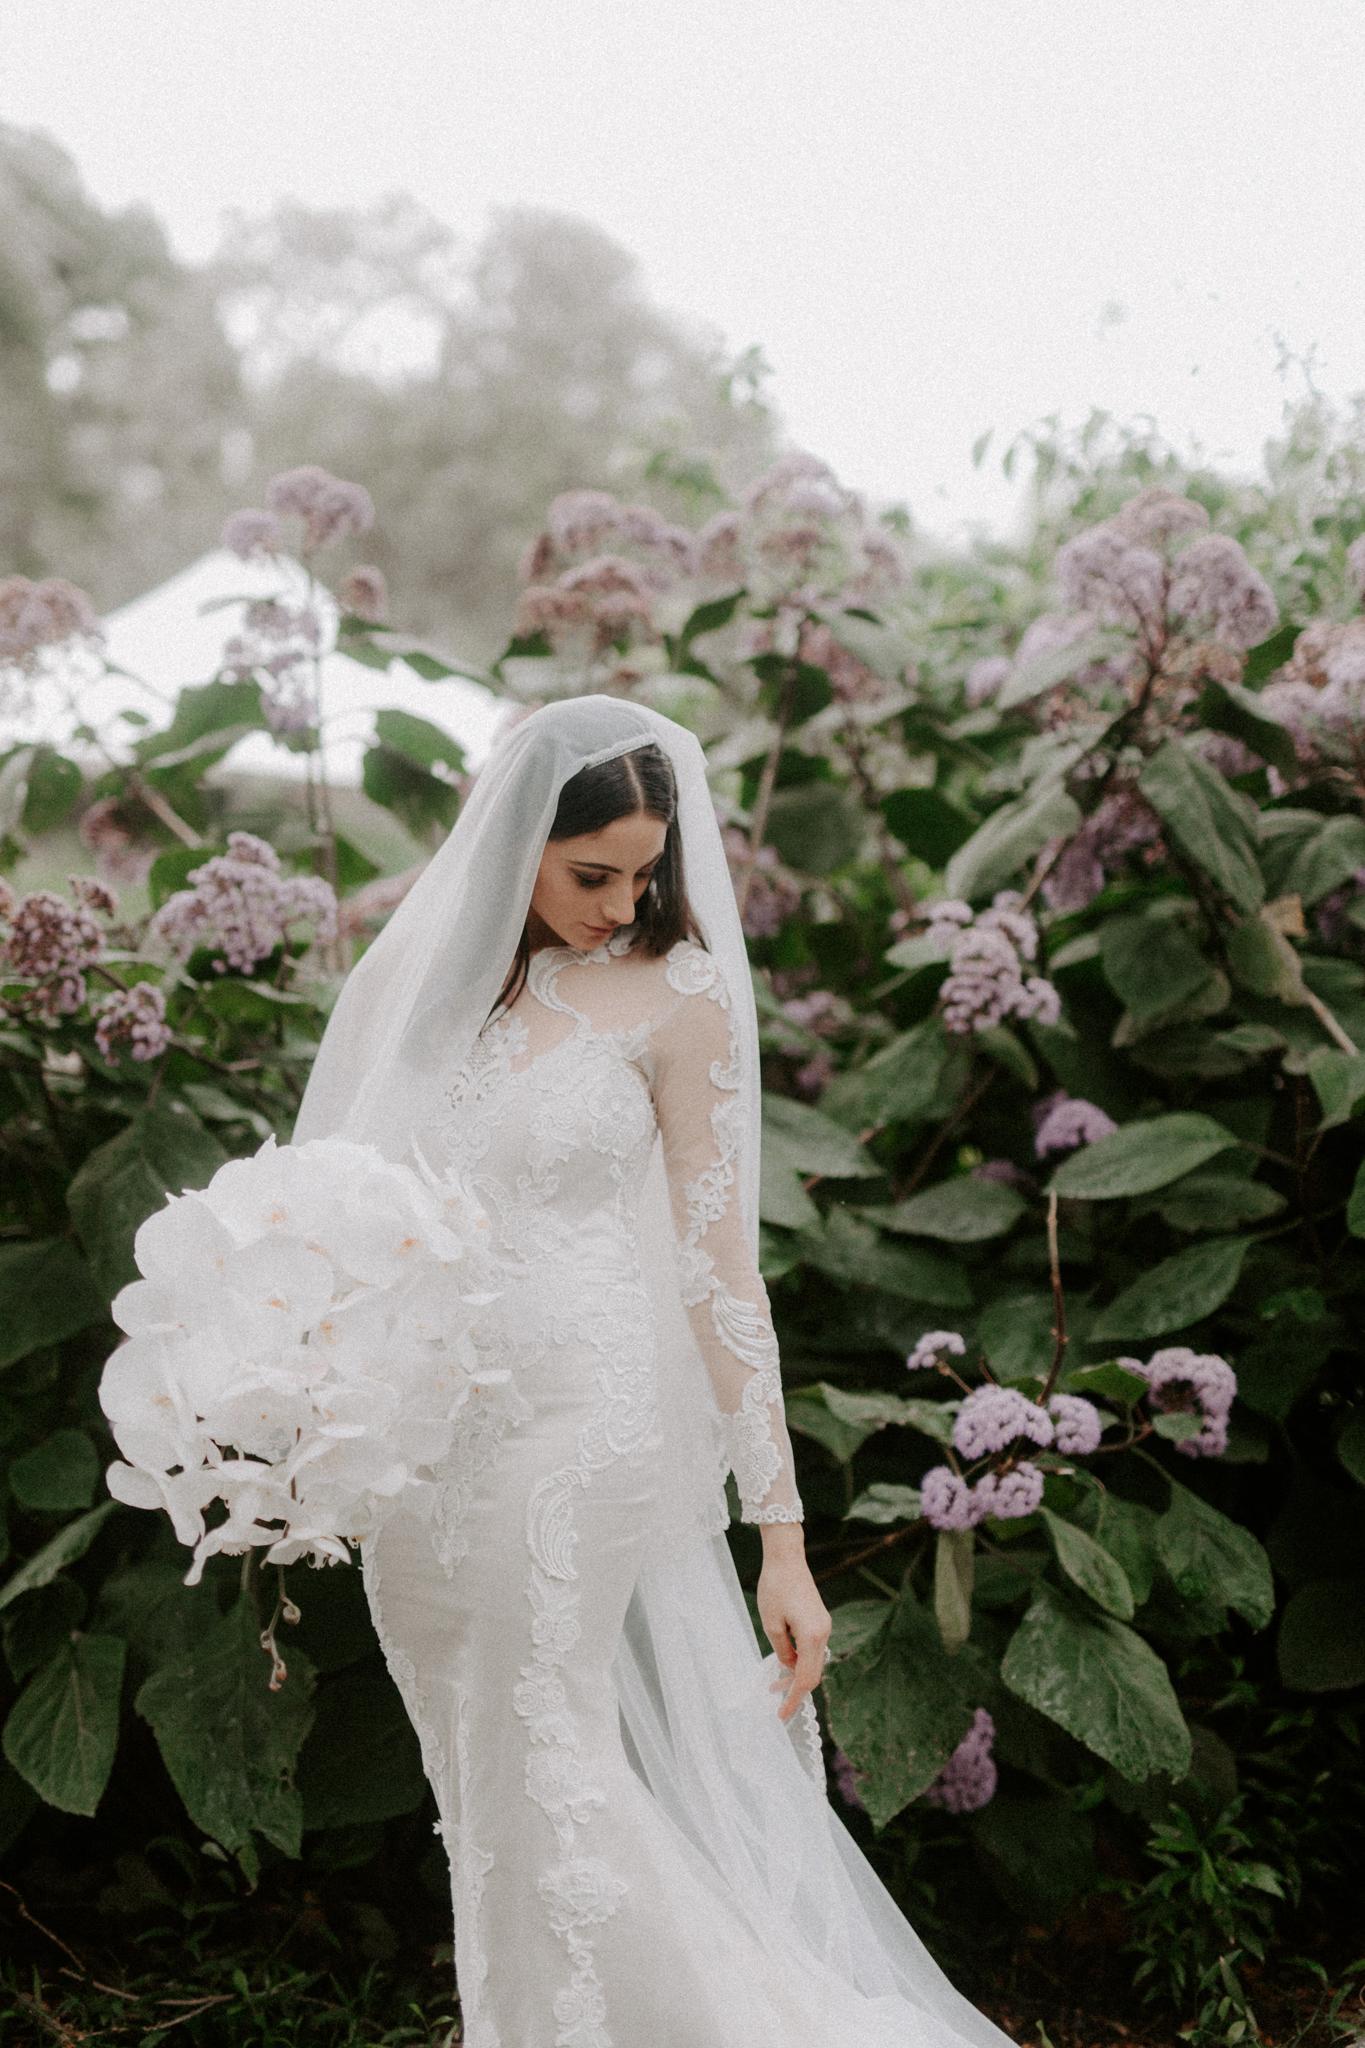 The-Terrace-Royal-Botanic-Gardens-Wedding-Emotions-and-Math-Photography-110.jpg